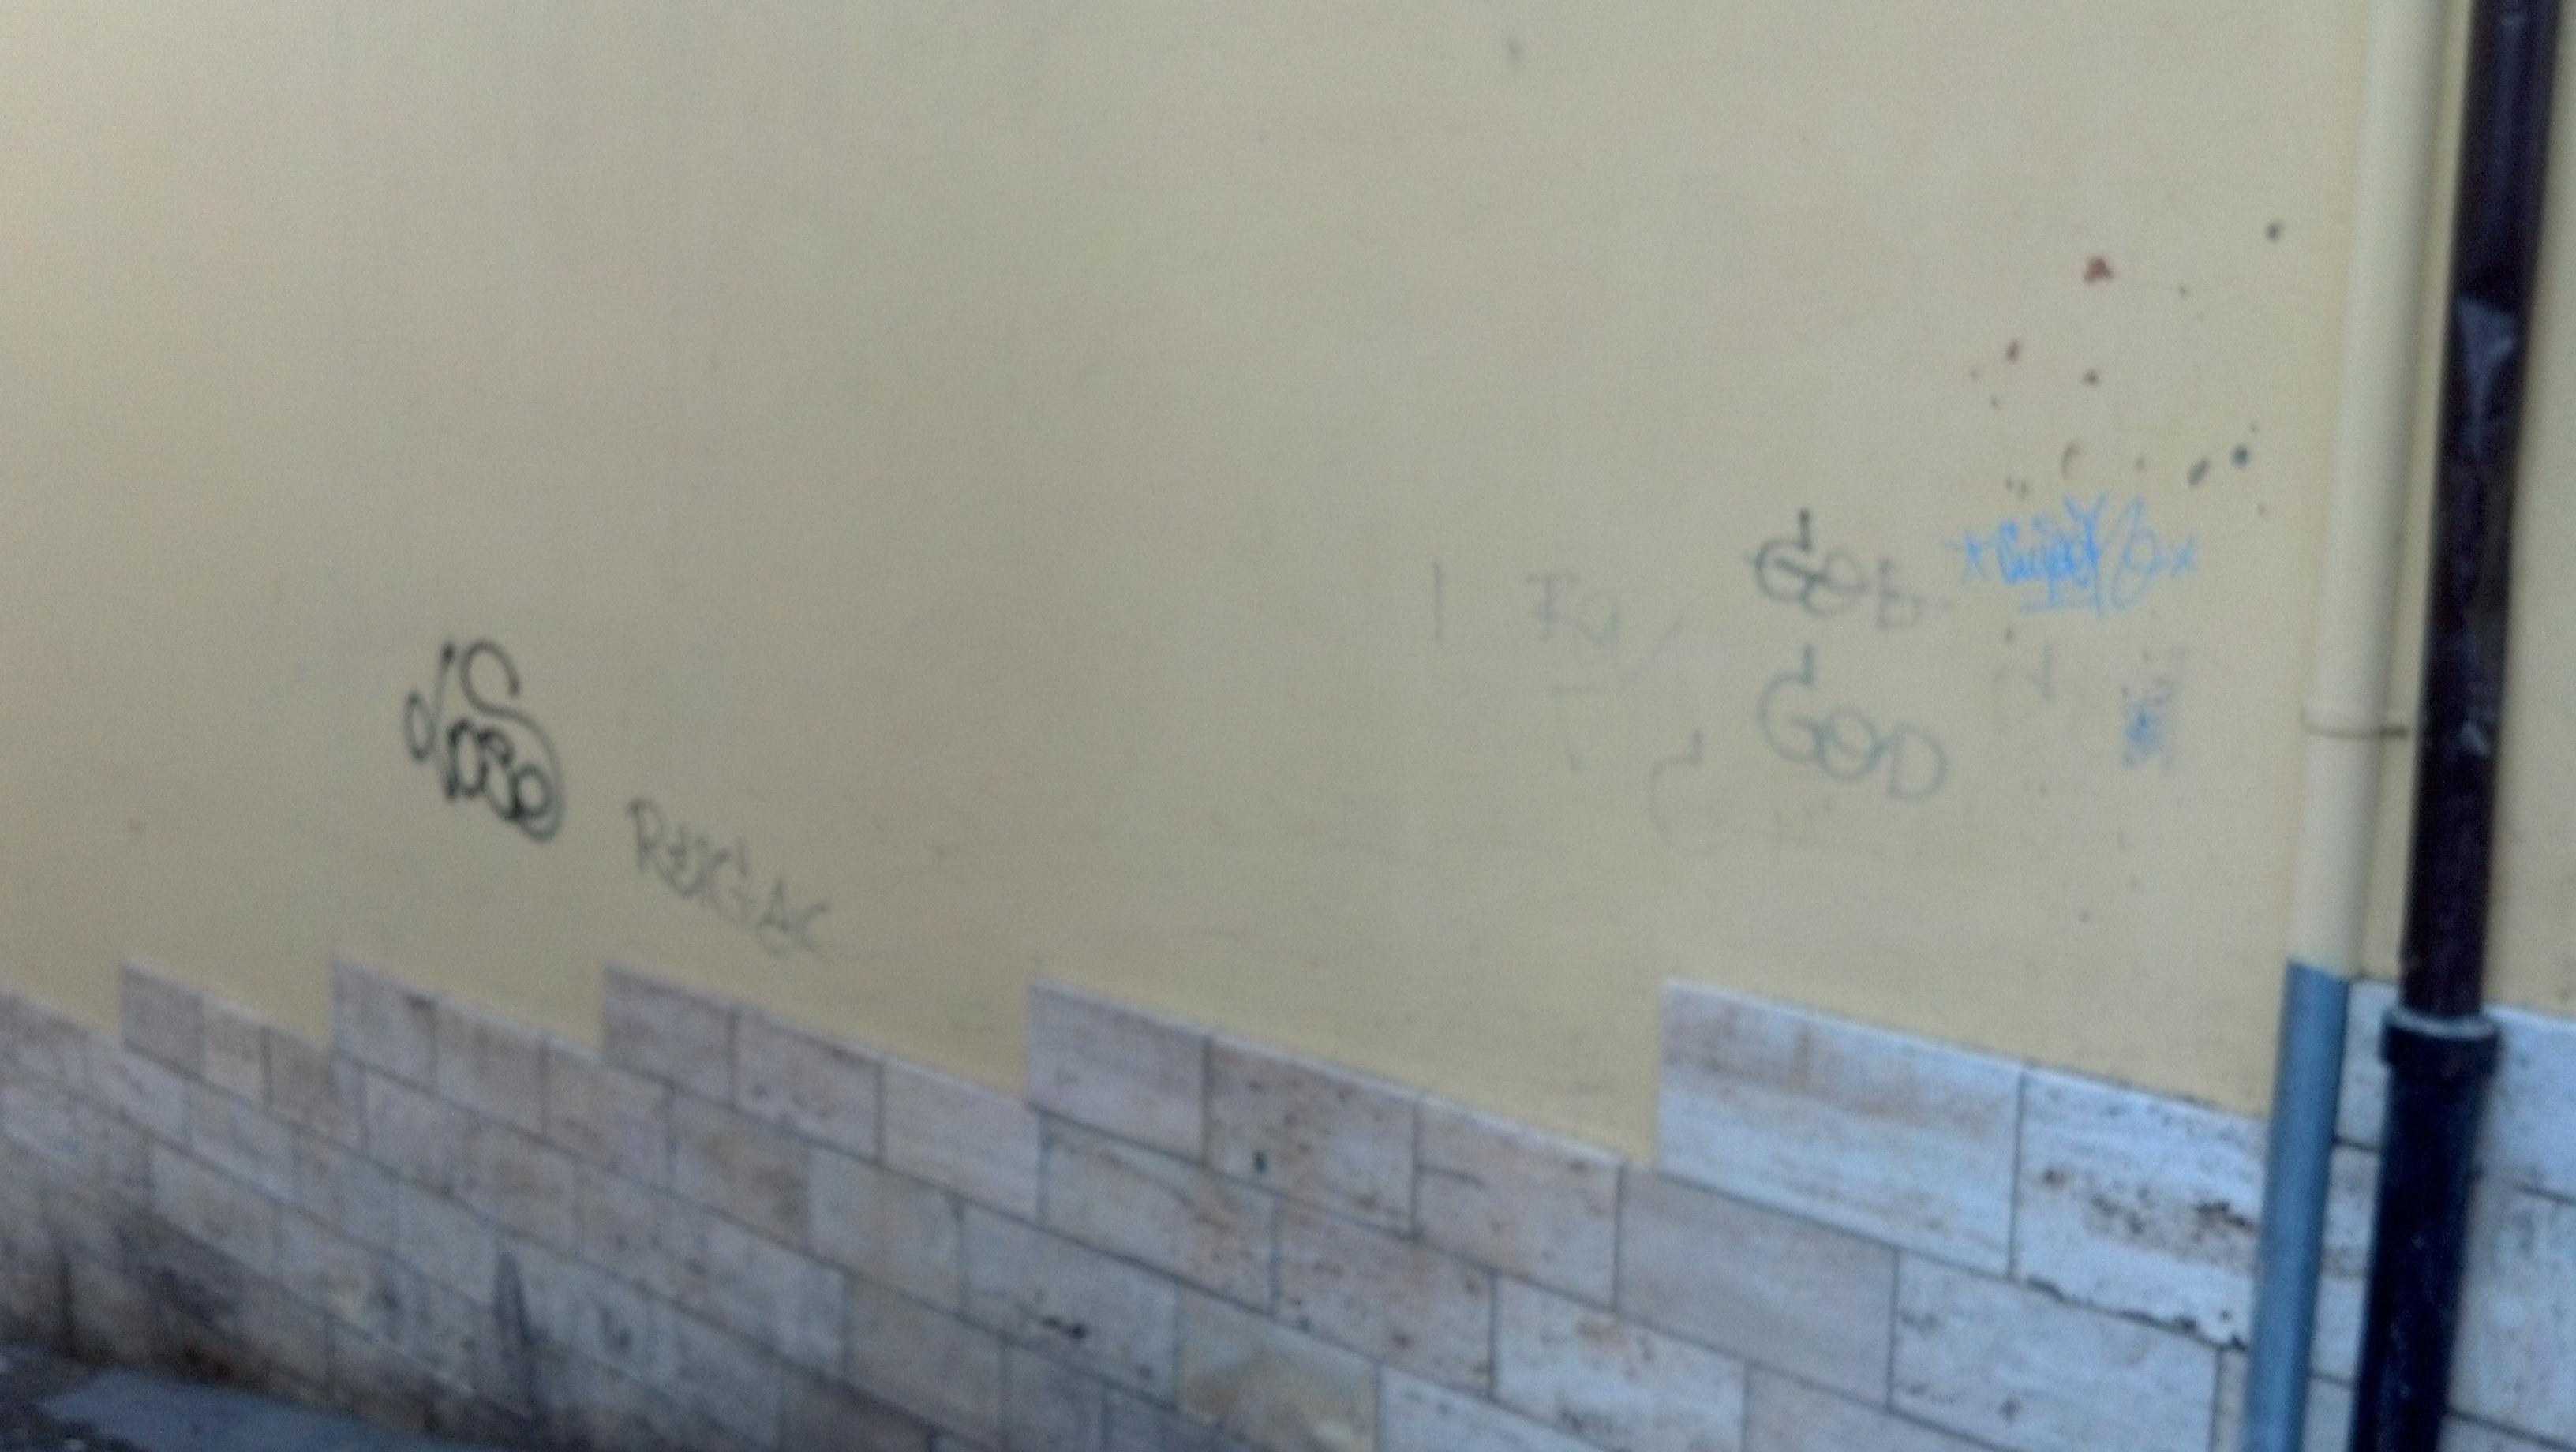 Graffiti ad Ascoli, ottobre 2012 32